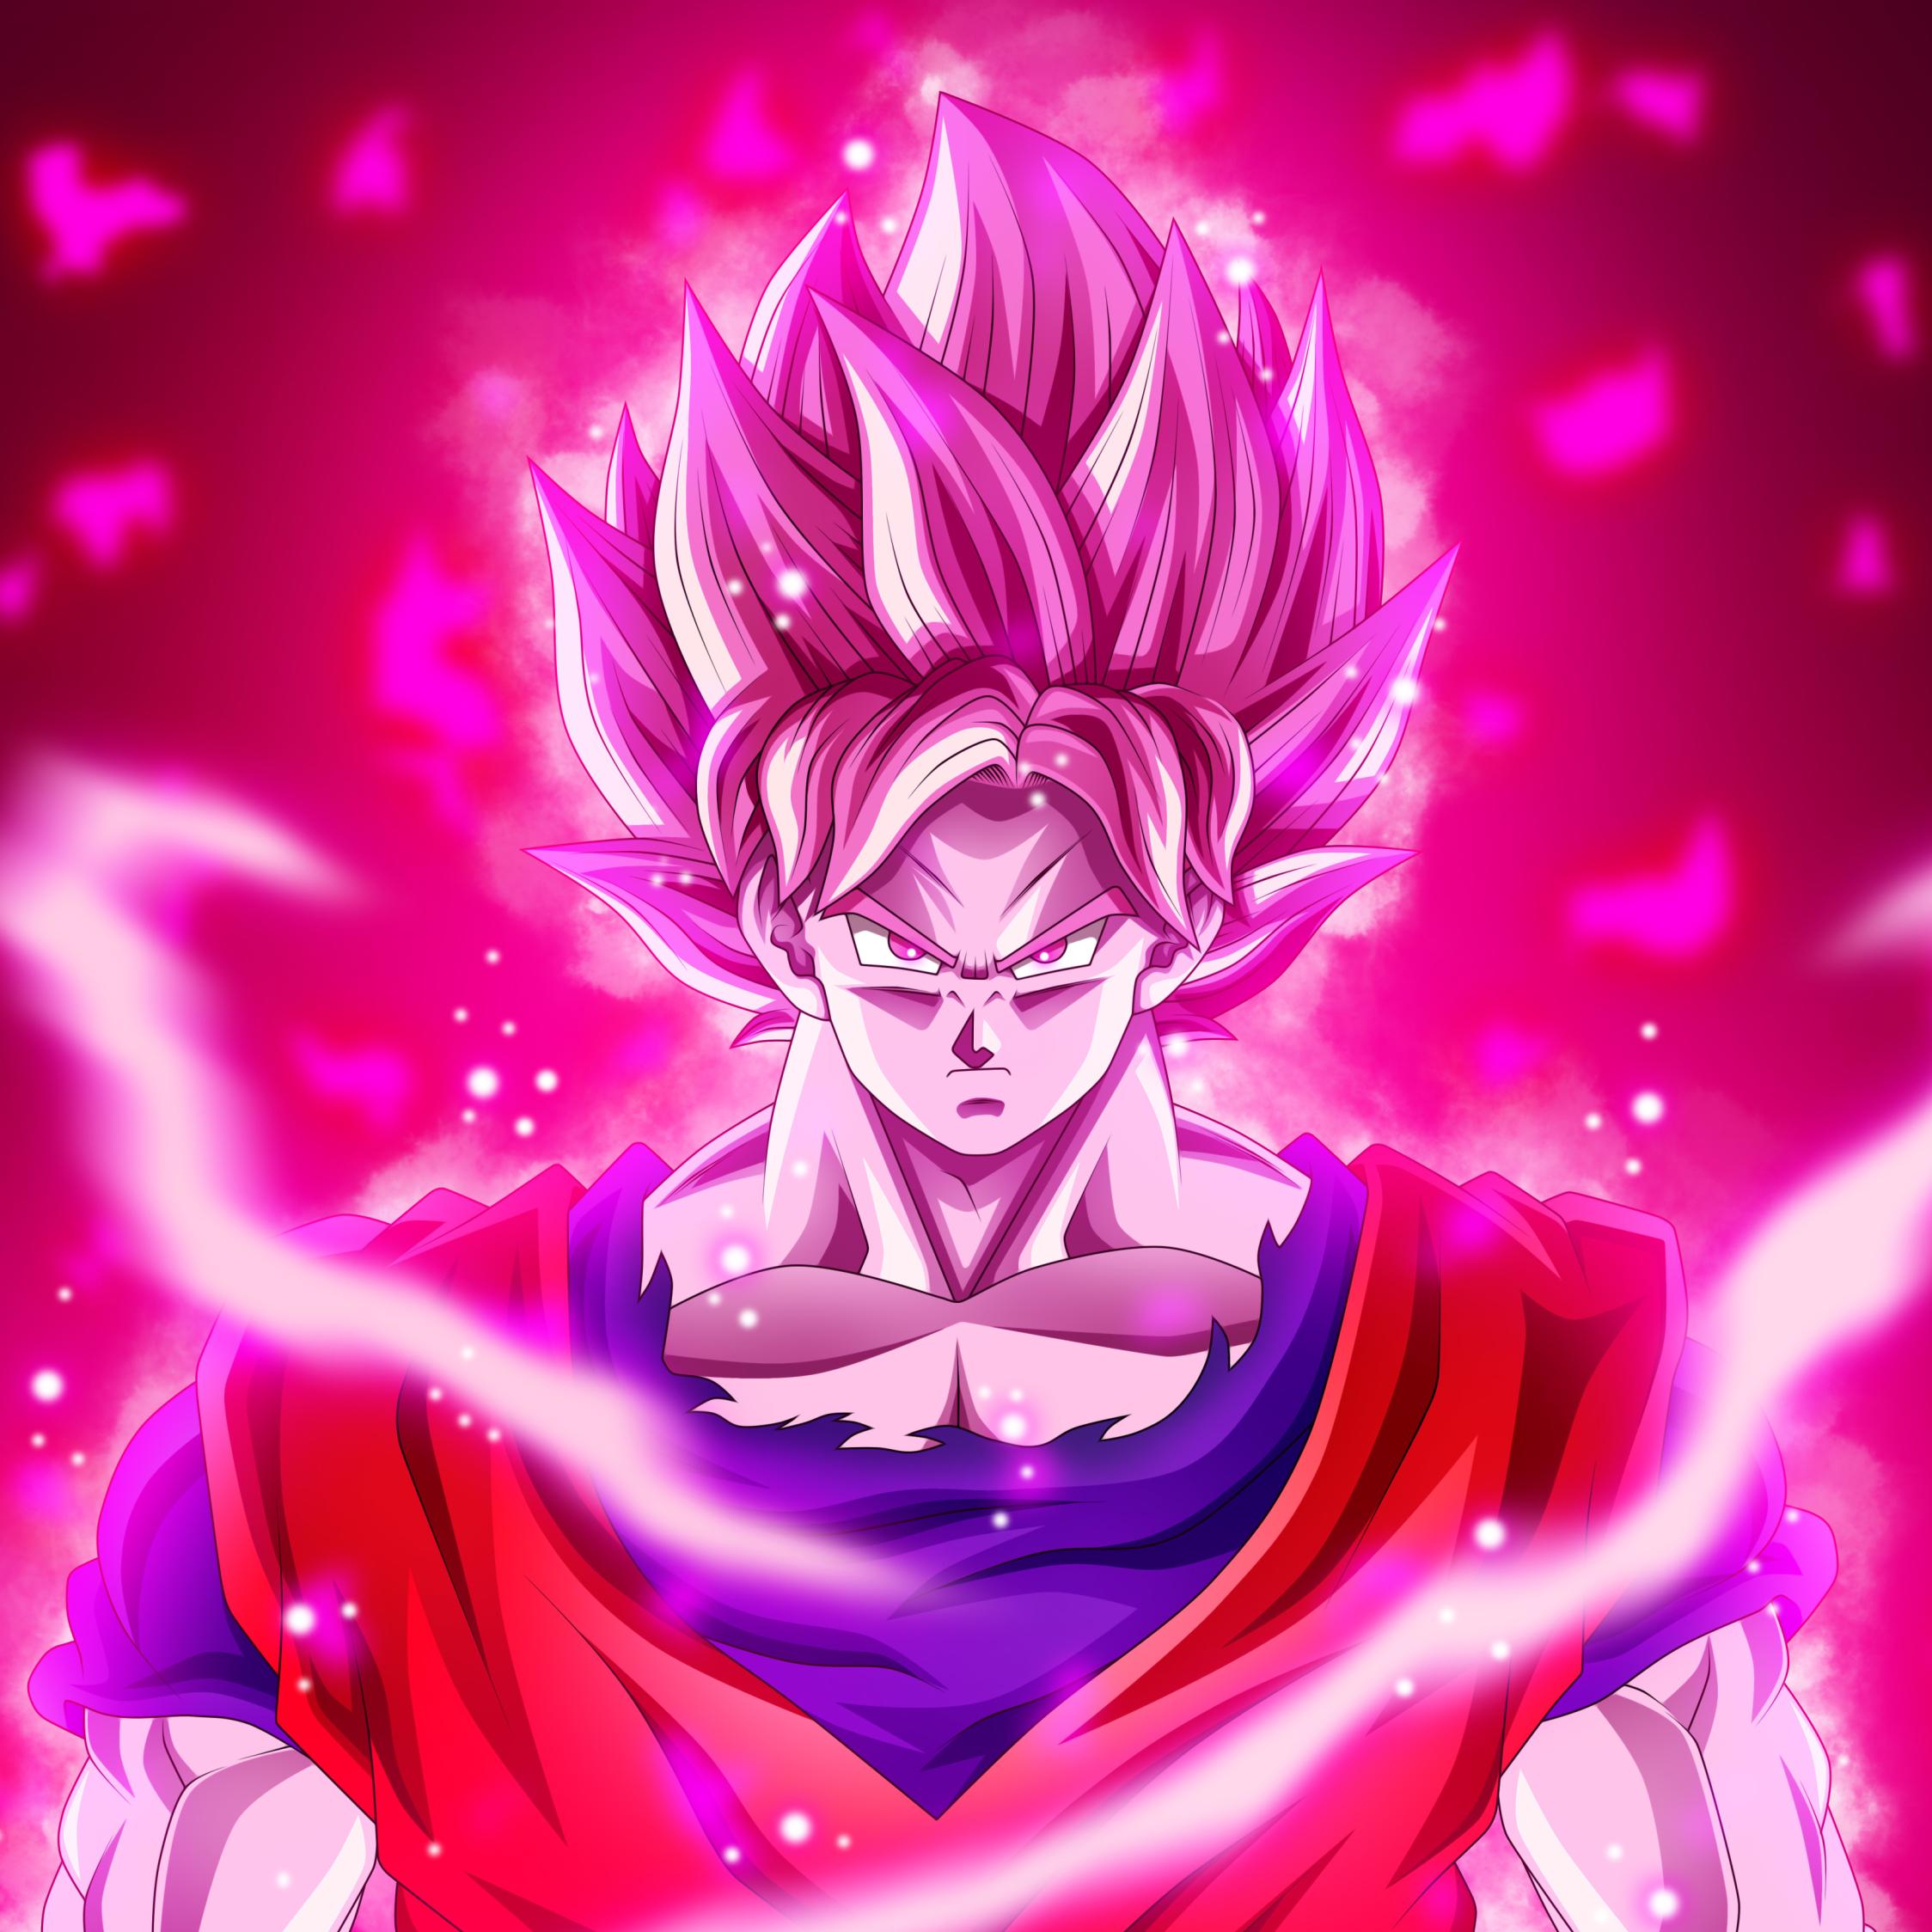 Dragon Ball Super Wallpaper Android Hd: Goku Dragon Ball Super, HD 8K Wallpaper